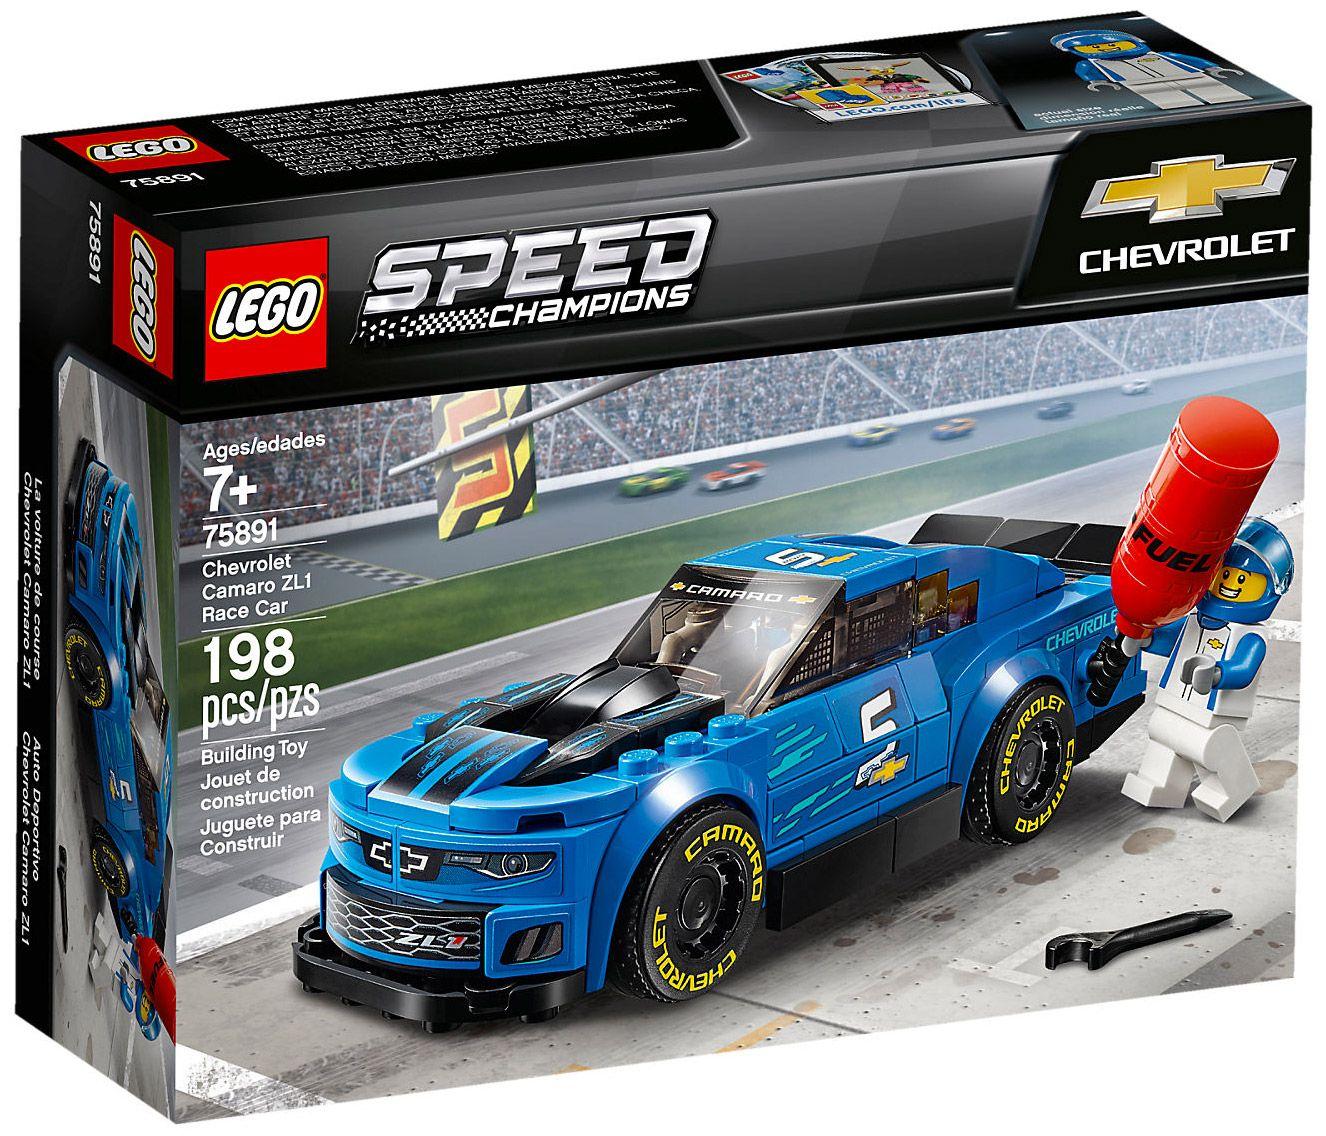 Lego Speed Champions 75891 La Voiture De Course Chevrolet Camaro Zl1